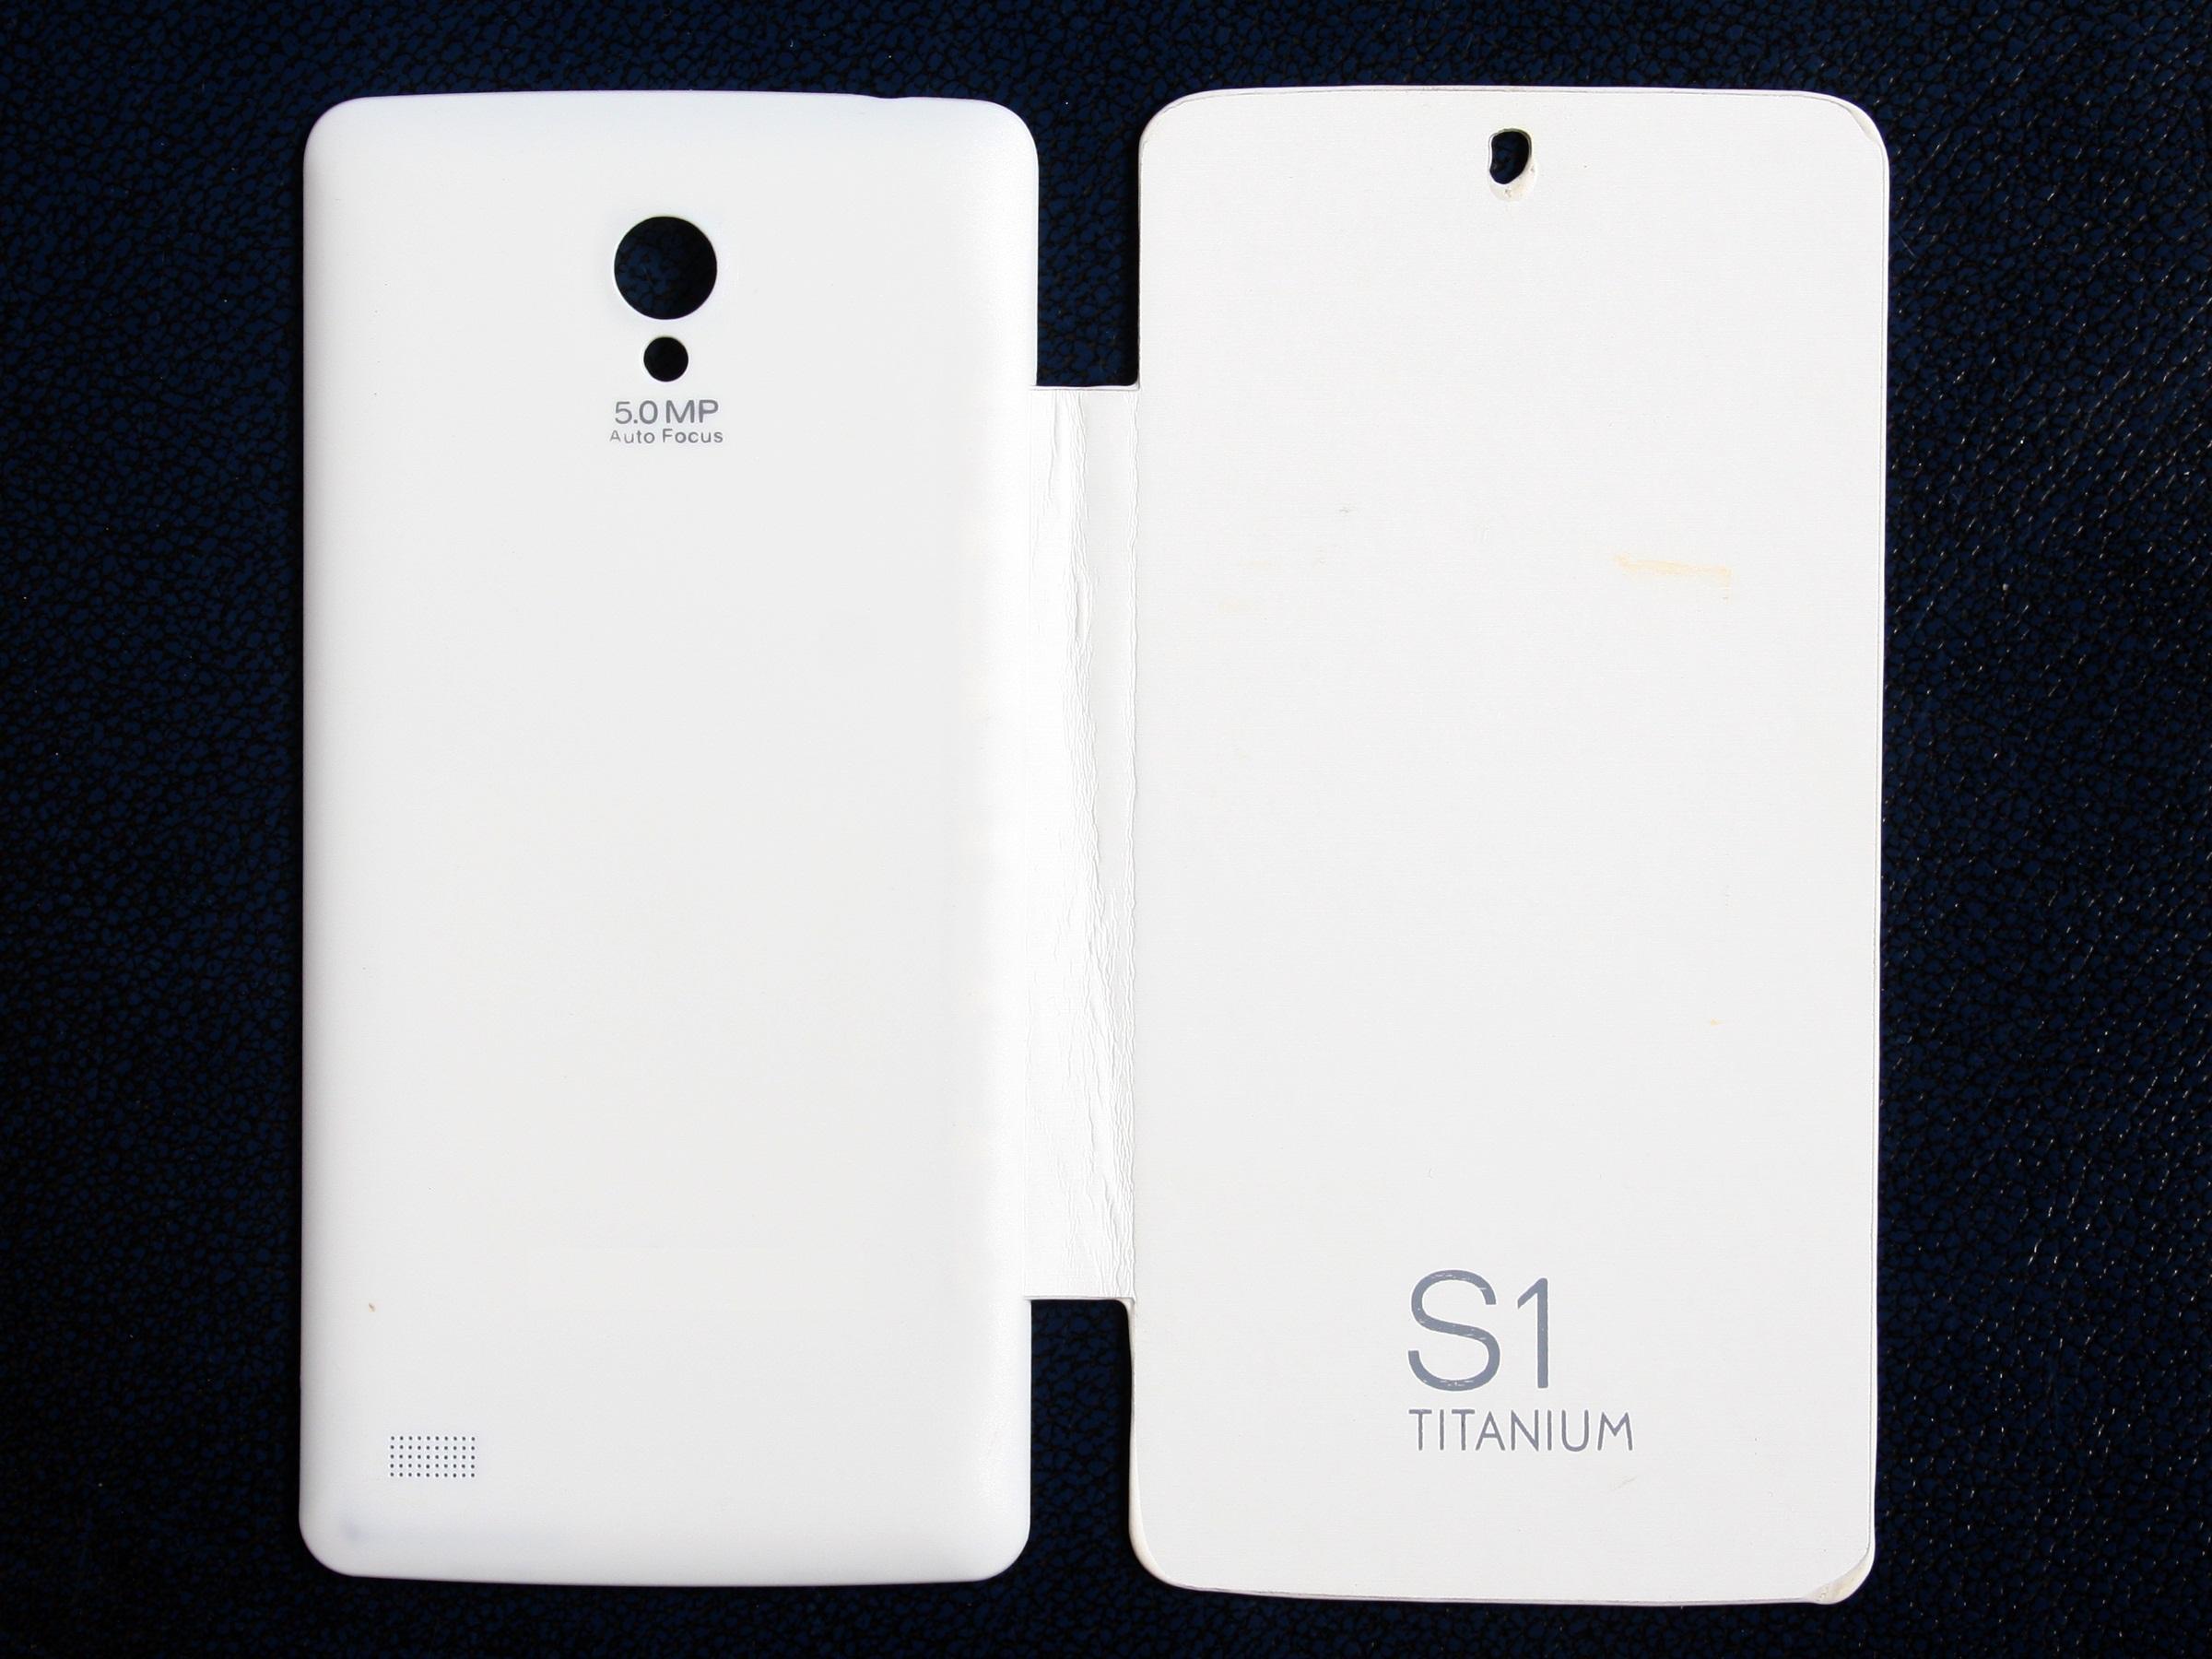 Koloredge Flip Cover For Karbonn S1 Titanium  White available at ShopClues for Rs.199